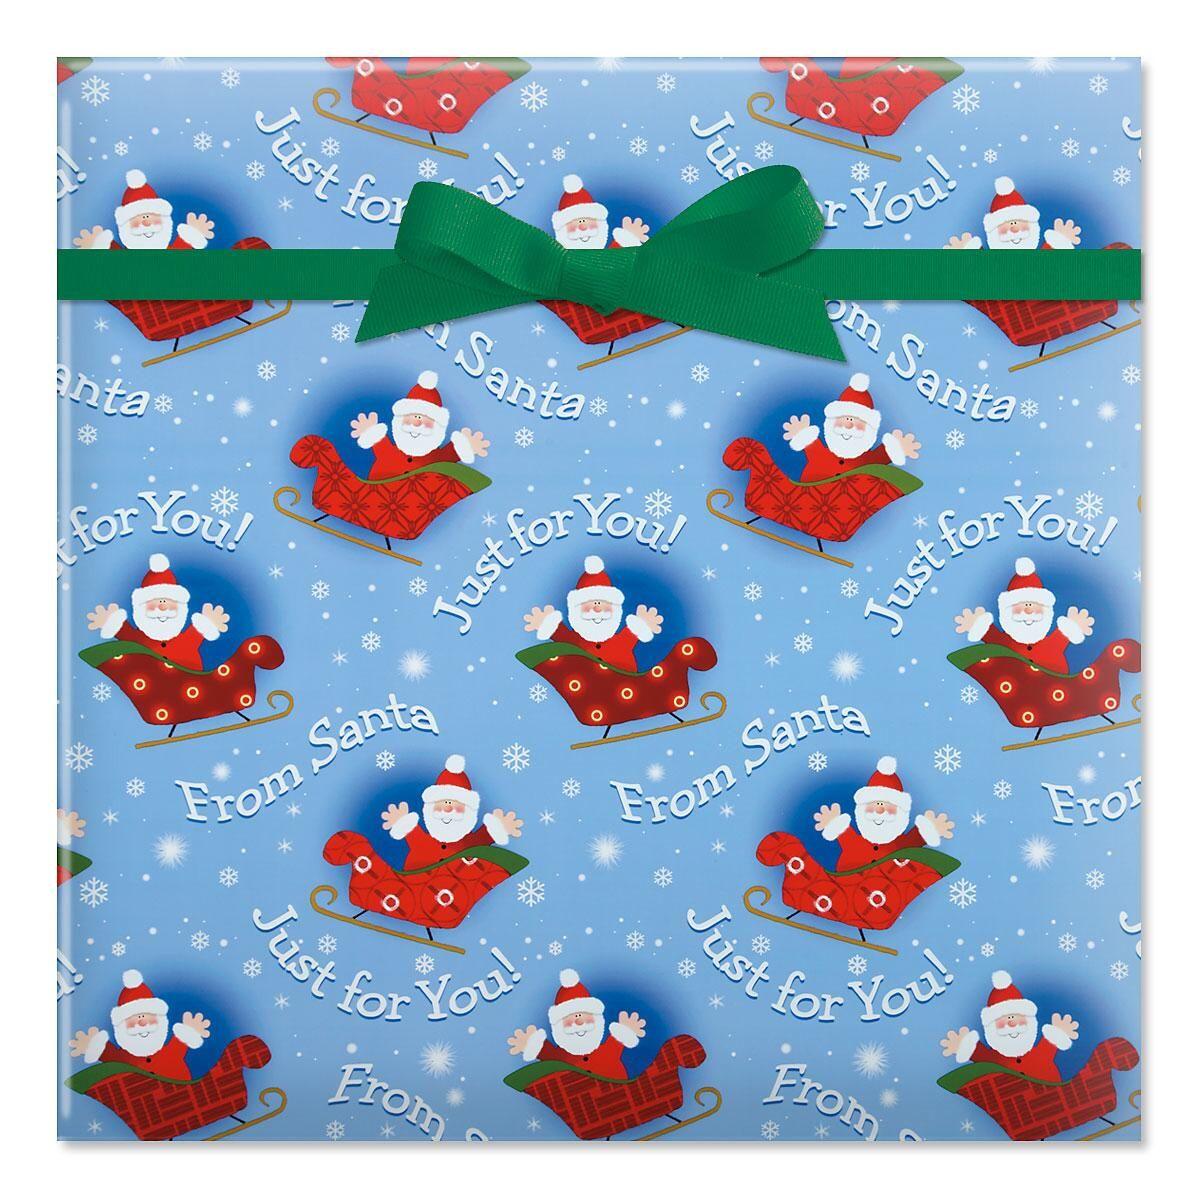 Santa on Sleigh Jumbo Rolled Gift Wrap